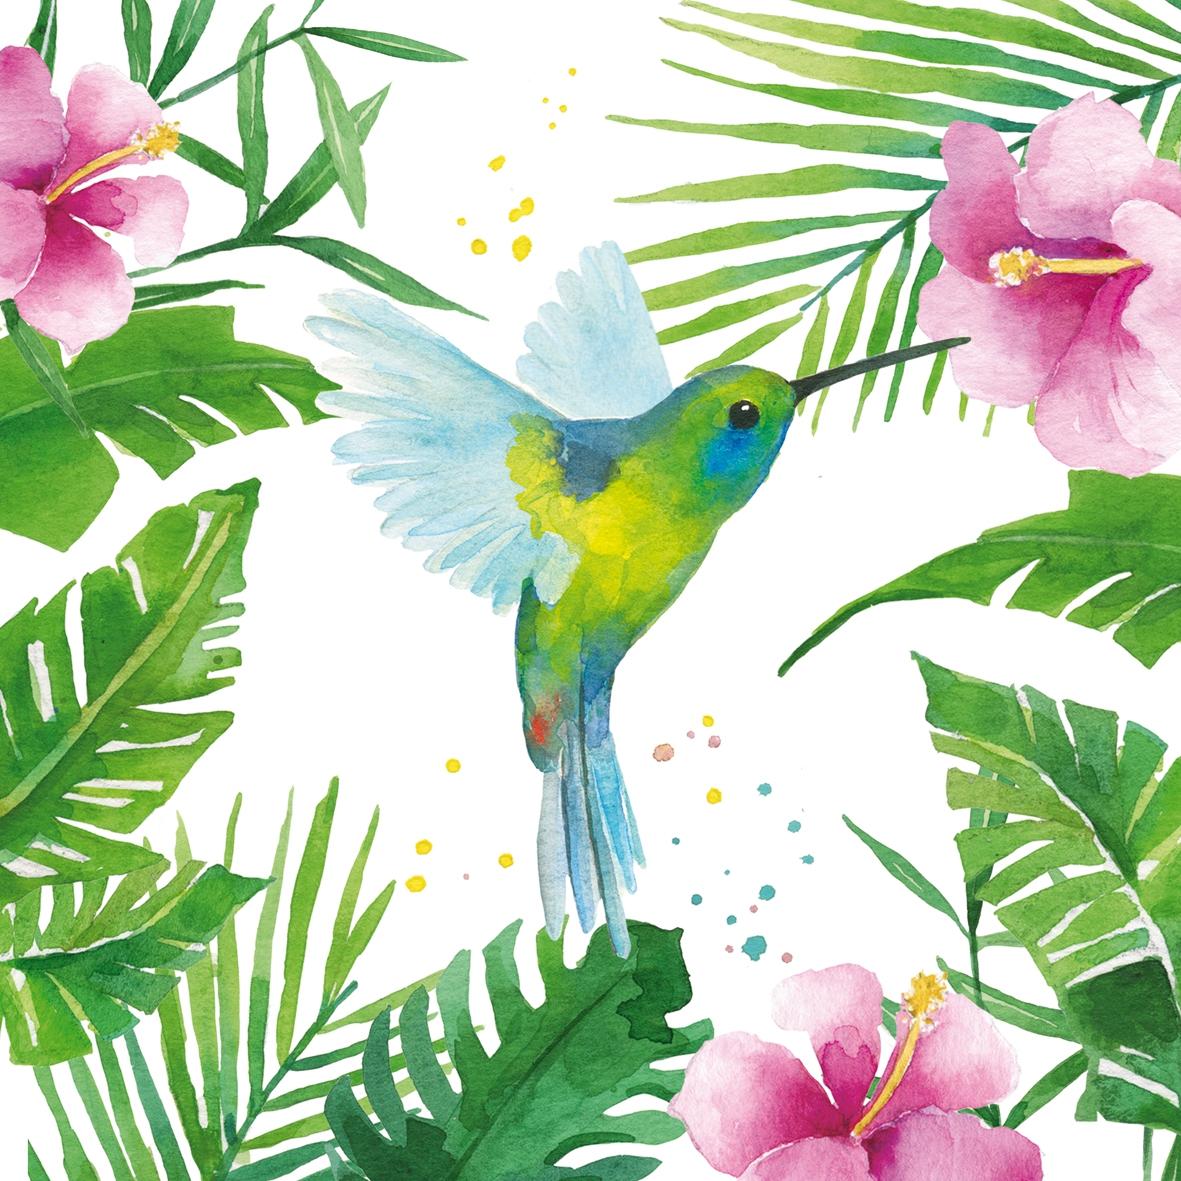 Colibri Hibiscus cocktail napkins tropical colibriwimmel napkins